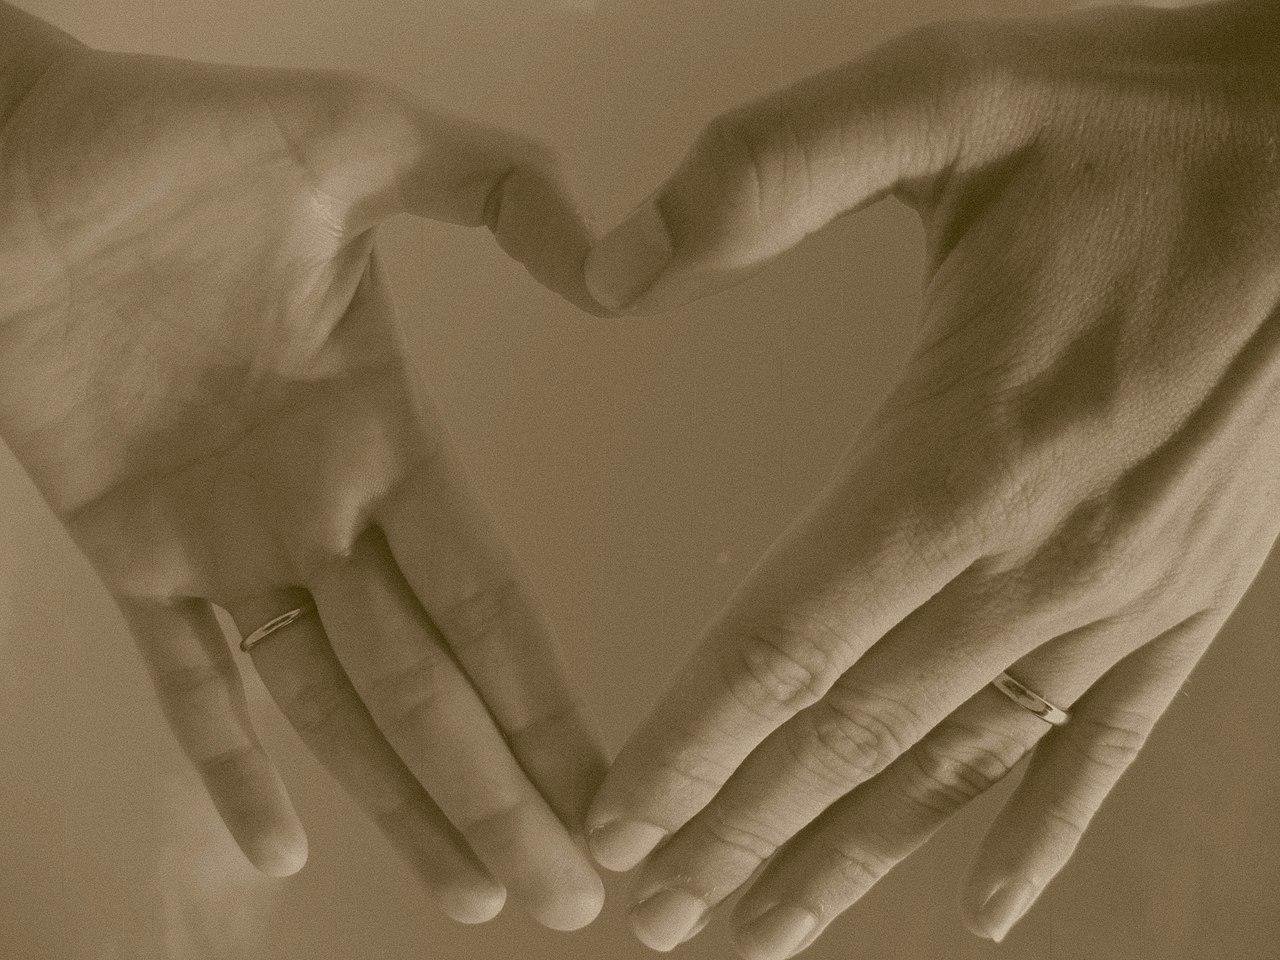 Wedding Ring Hand Us